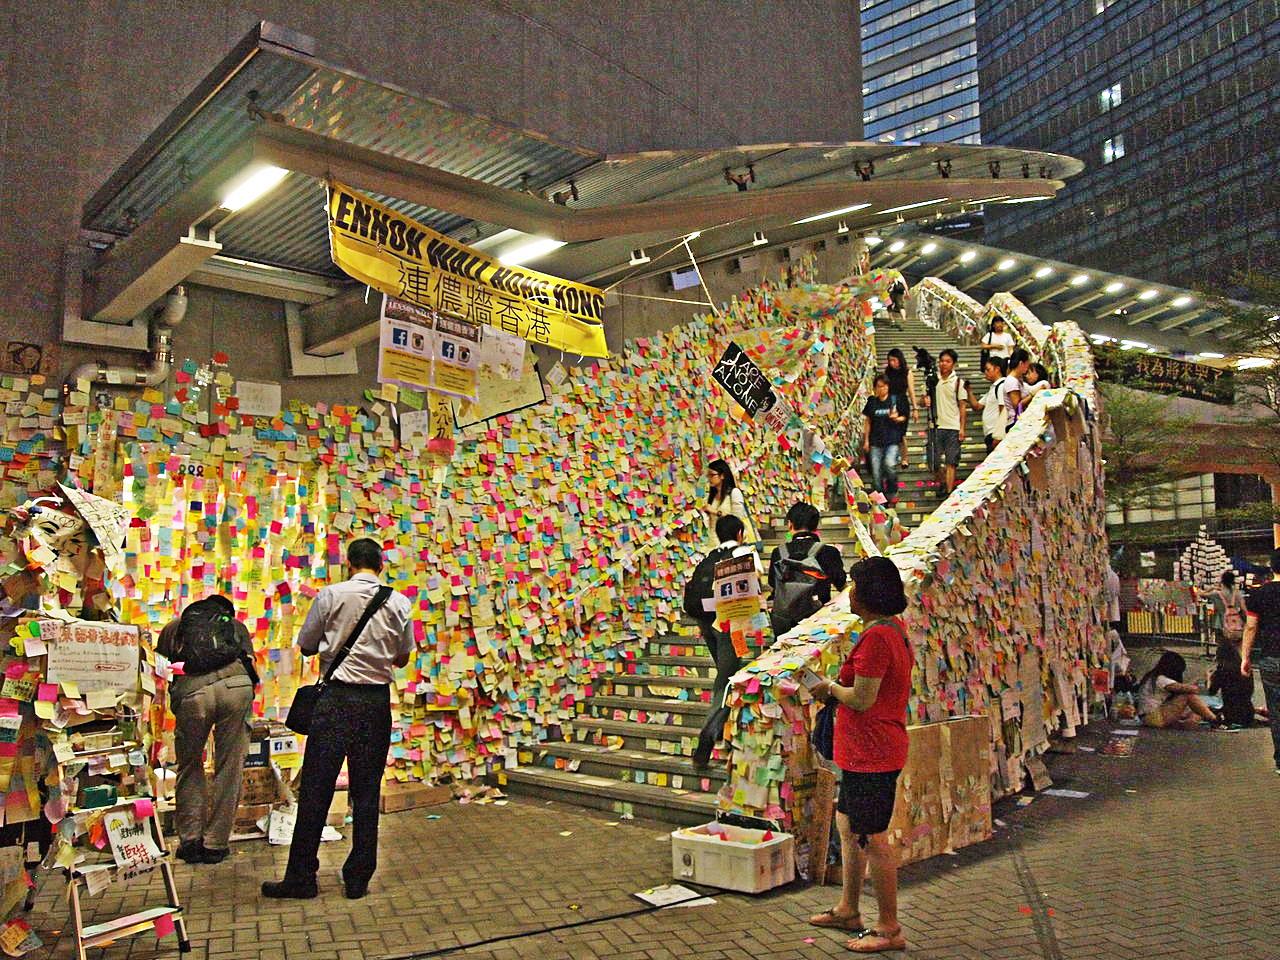 Il primo Lennon Wall a Hong Kong (2014)